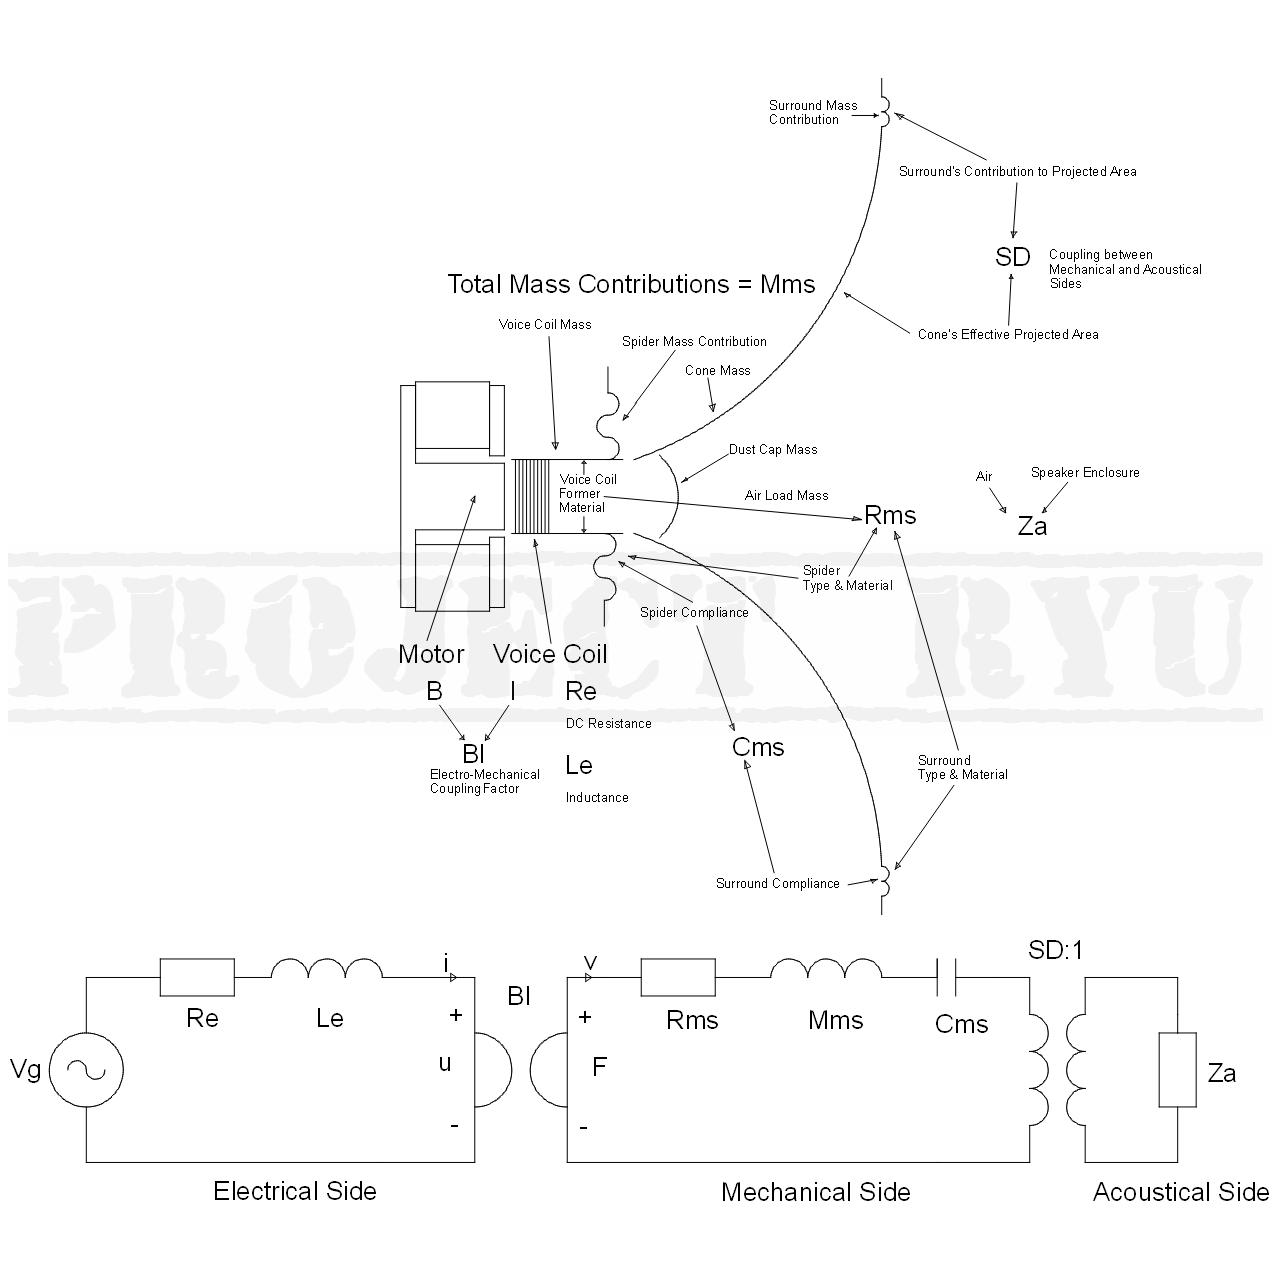 1280x1280 Project Ryu Electrical Model Of Loudspeaker Parameters